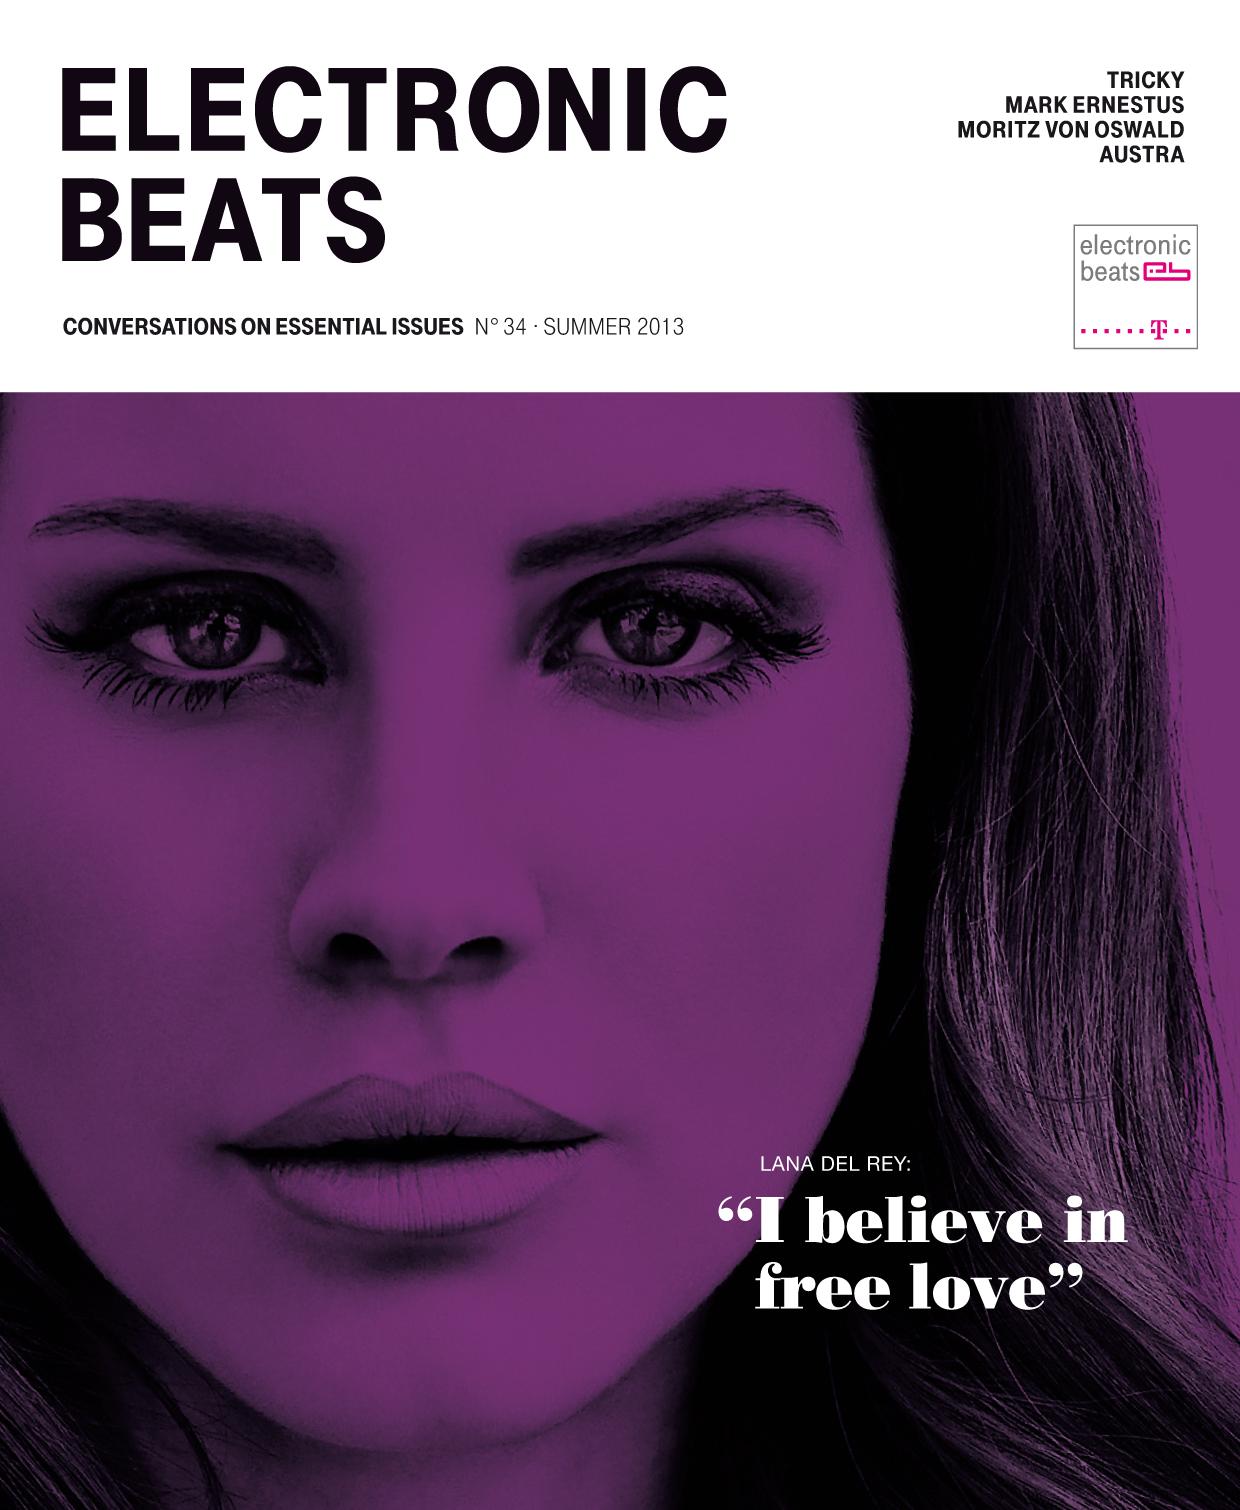 Electronic Beats Magazine Summer 2013 hits shelves June 24th